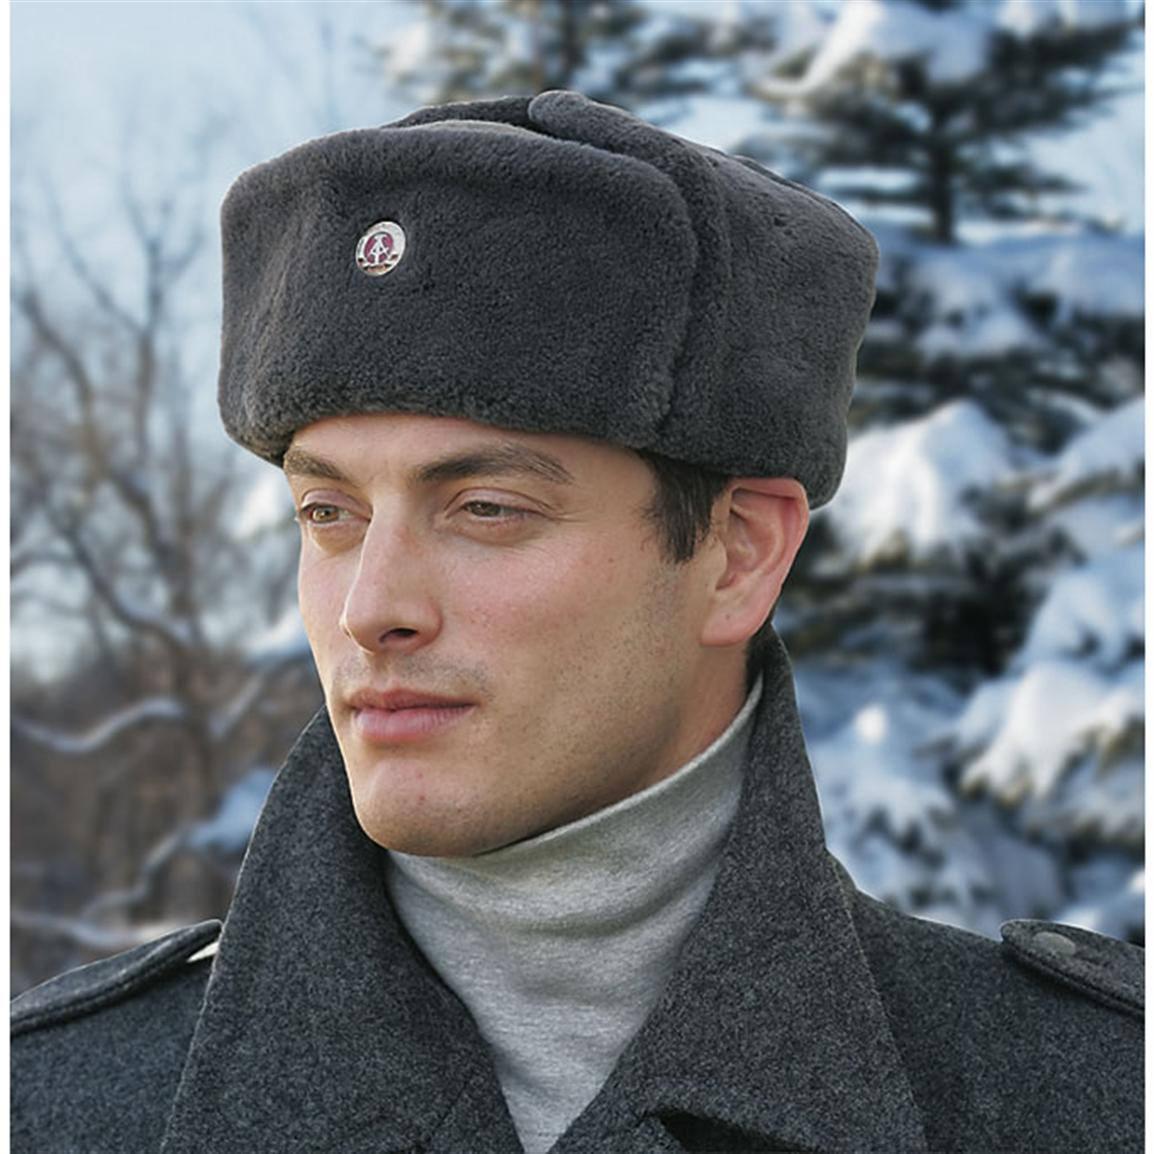 b212fffde Vintage East German army grey fur lined winter hat cap military Communist  NVA DDR GDR Soviet Era soldier